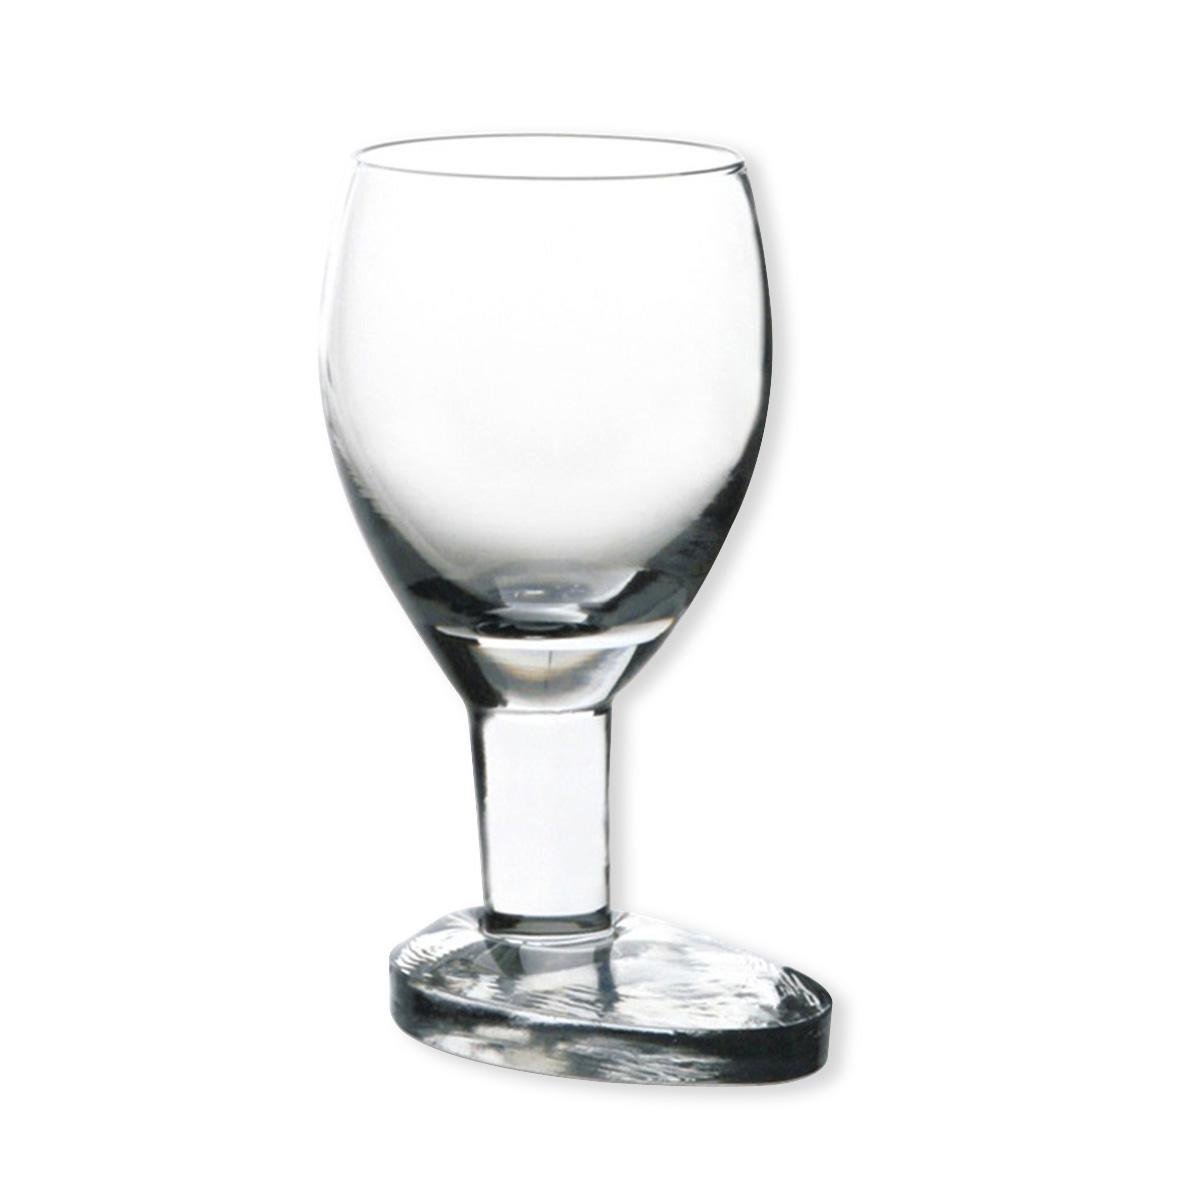 Verre à Vin DANDY - Soufflé Bouche - Style Contemporain - Bruno Evrard d0f128fe6816